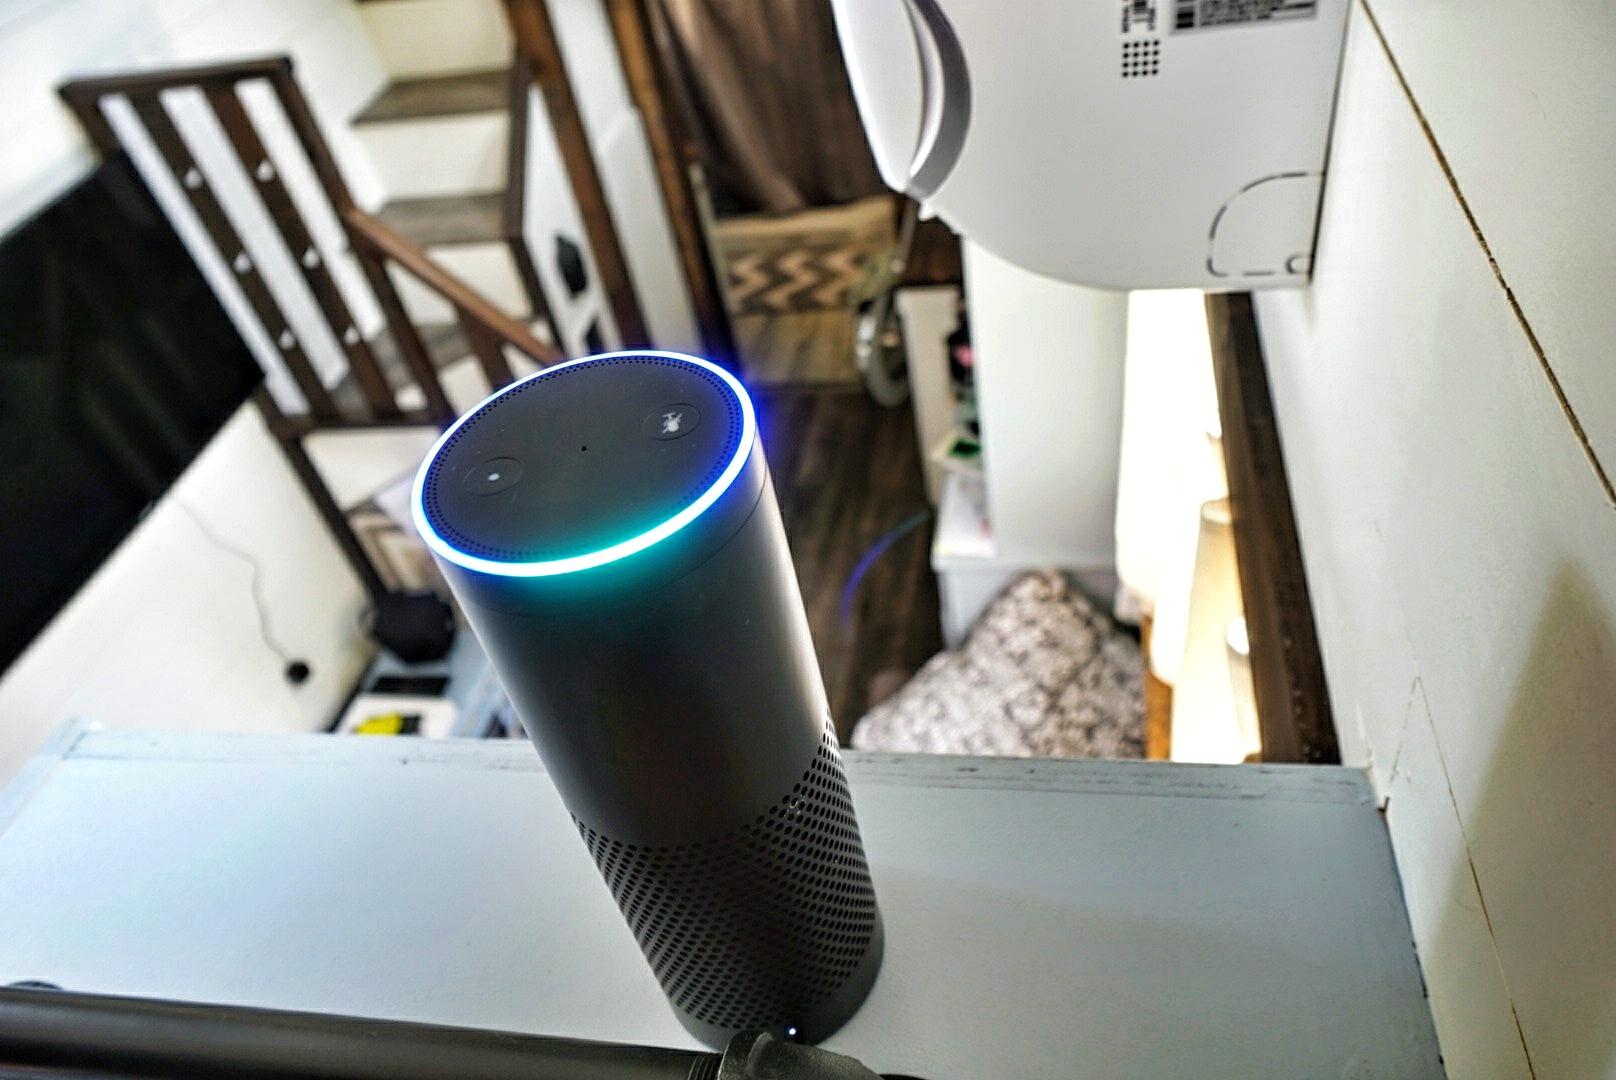 Smarthome Tiny Home Amazon Alexa echo